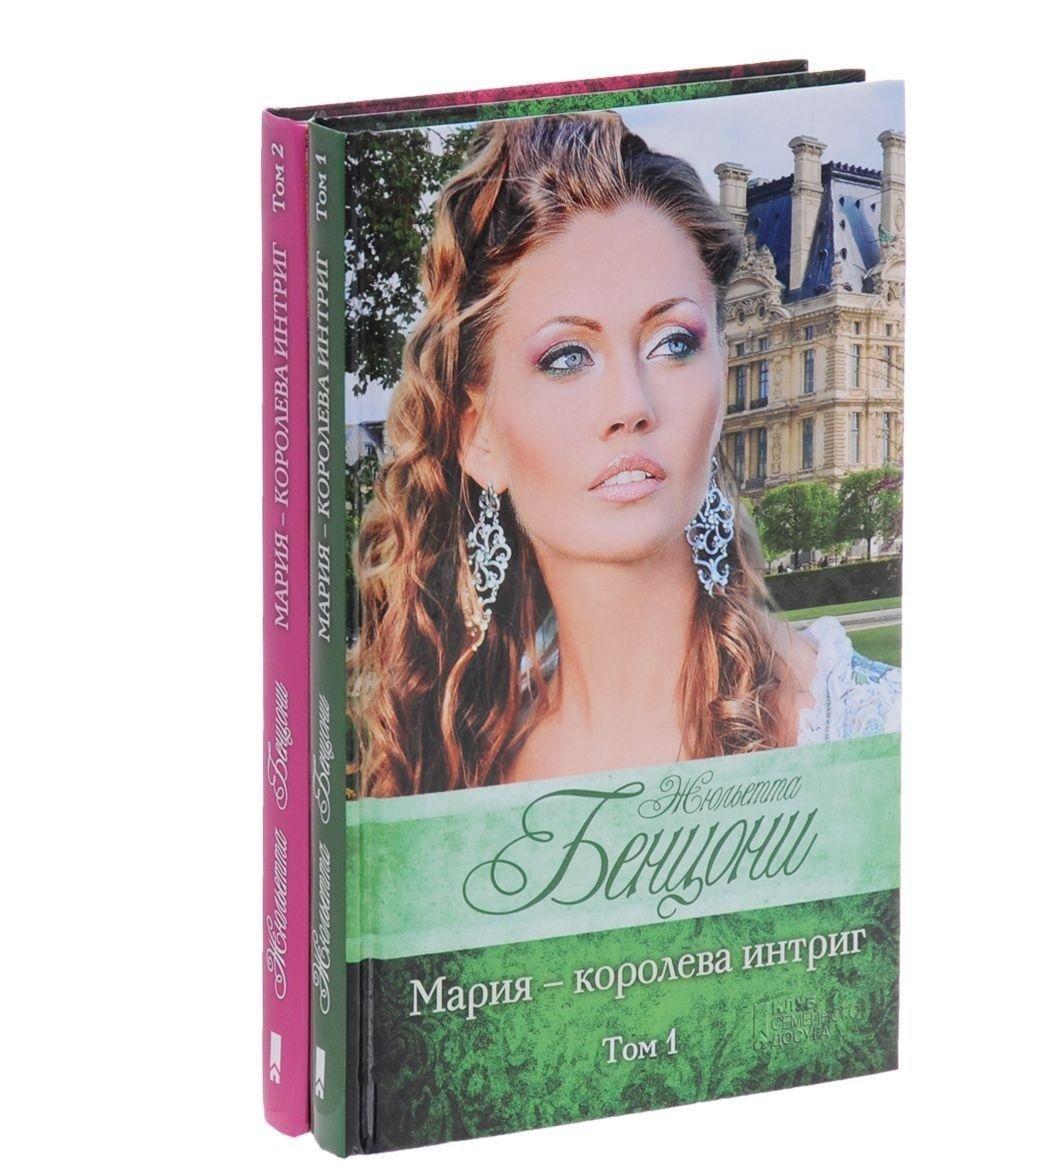 Бенцони Ж. Мария - королева интриг. (комплект) бенцони ж принцесса вандалов